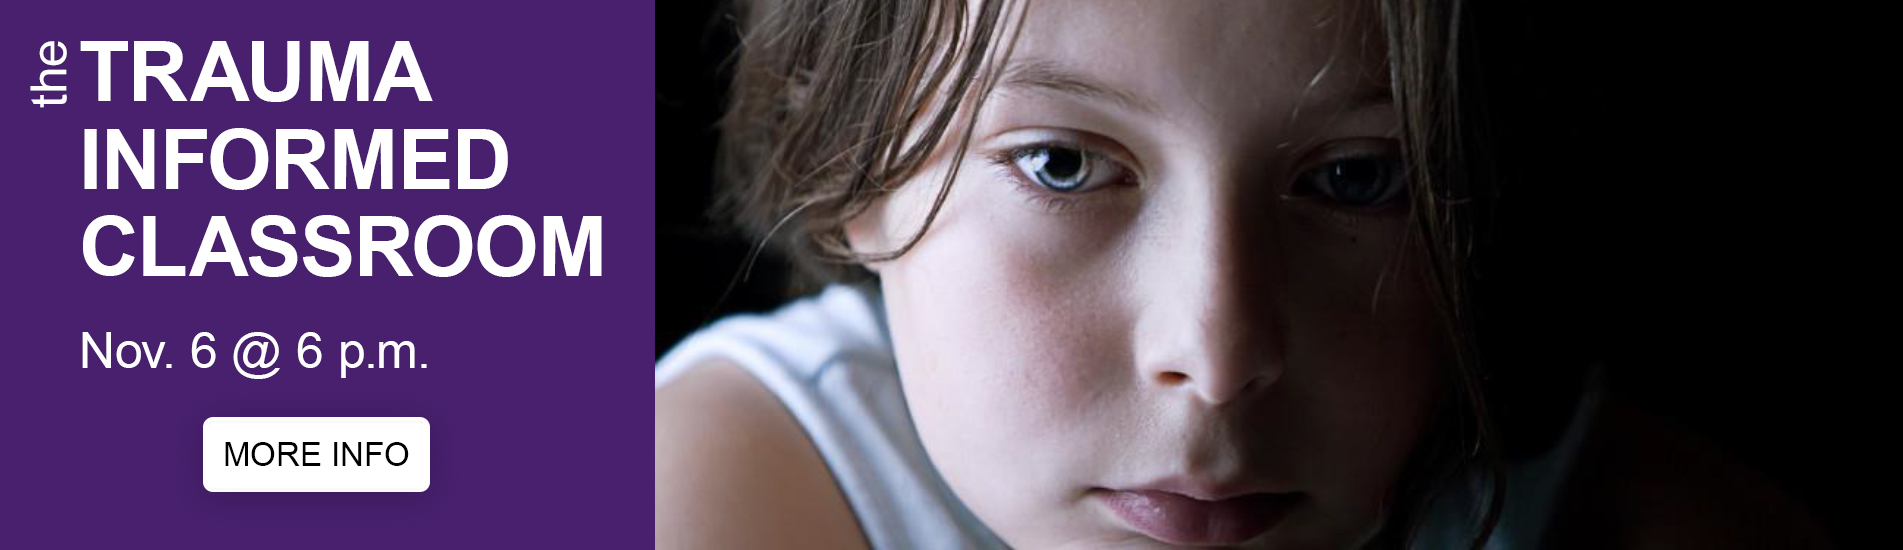 Trauma Informed Classroom speaker Darcie Van Voorst November 6 at 6pm